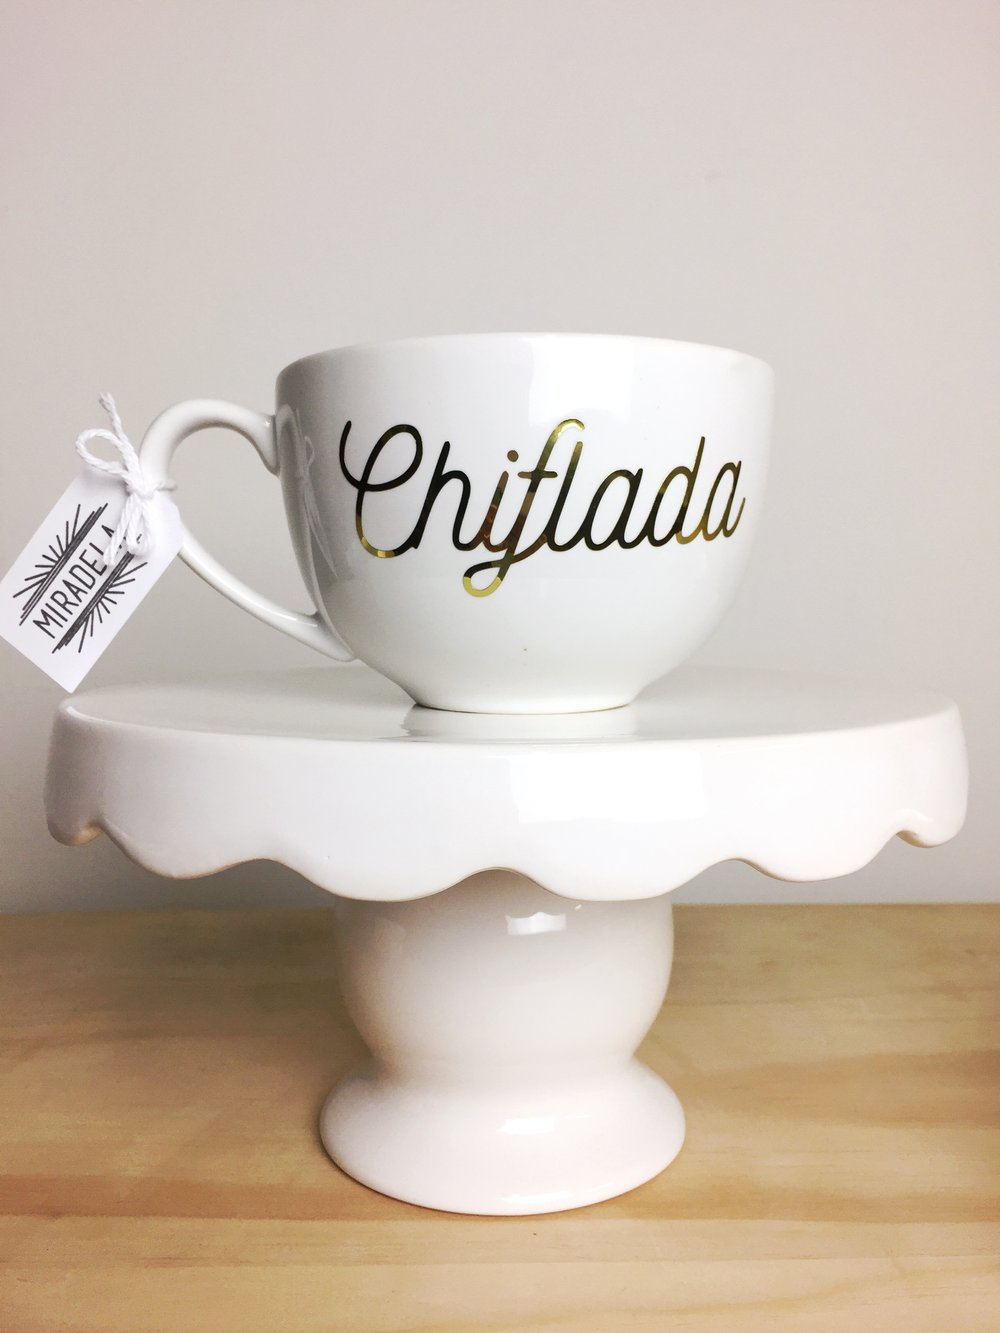 Chiflada Cup